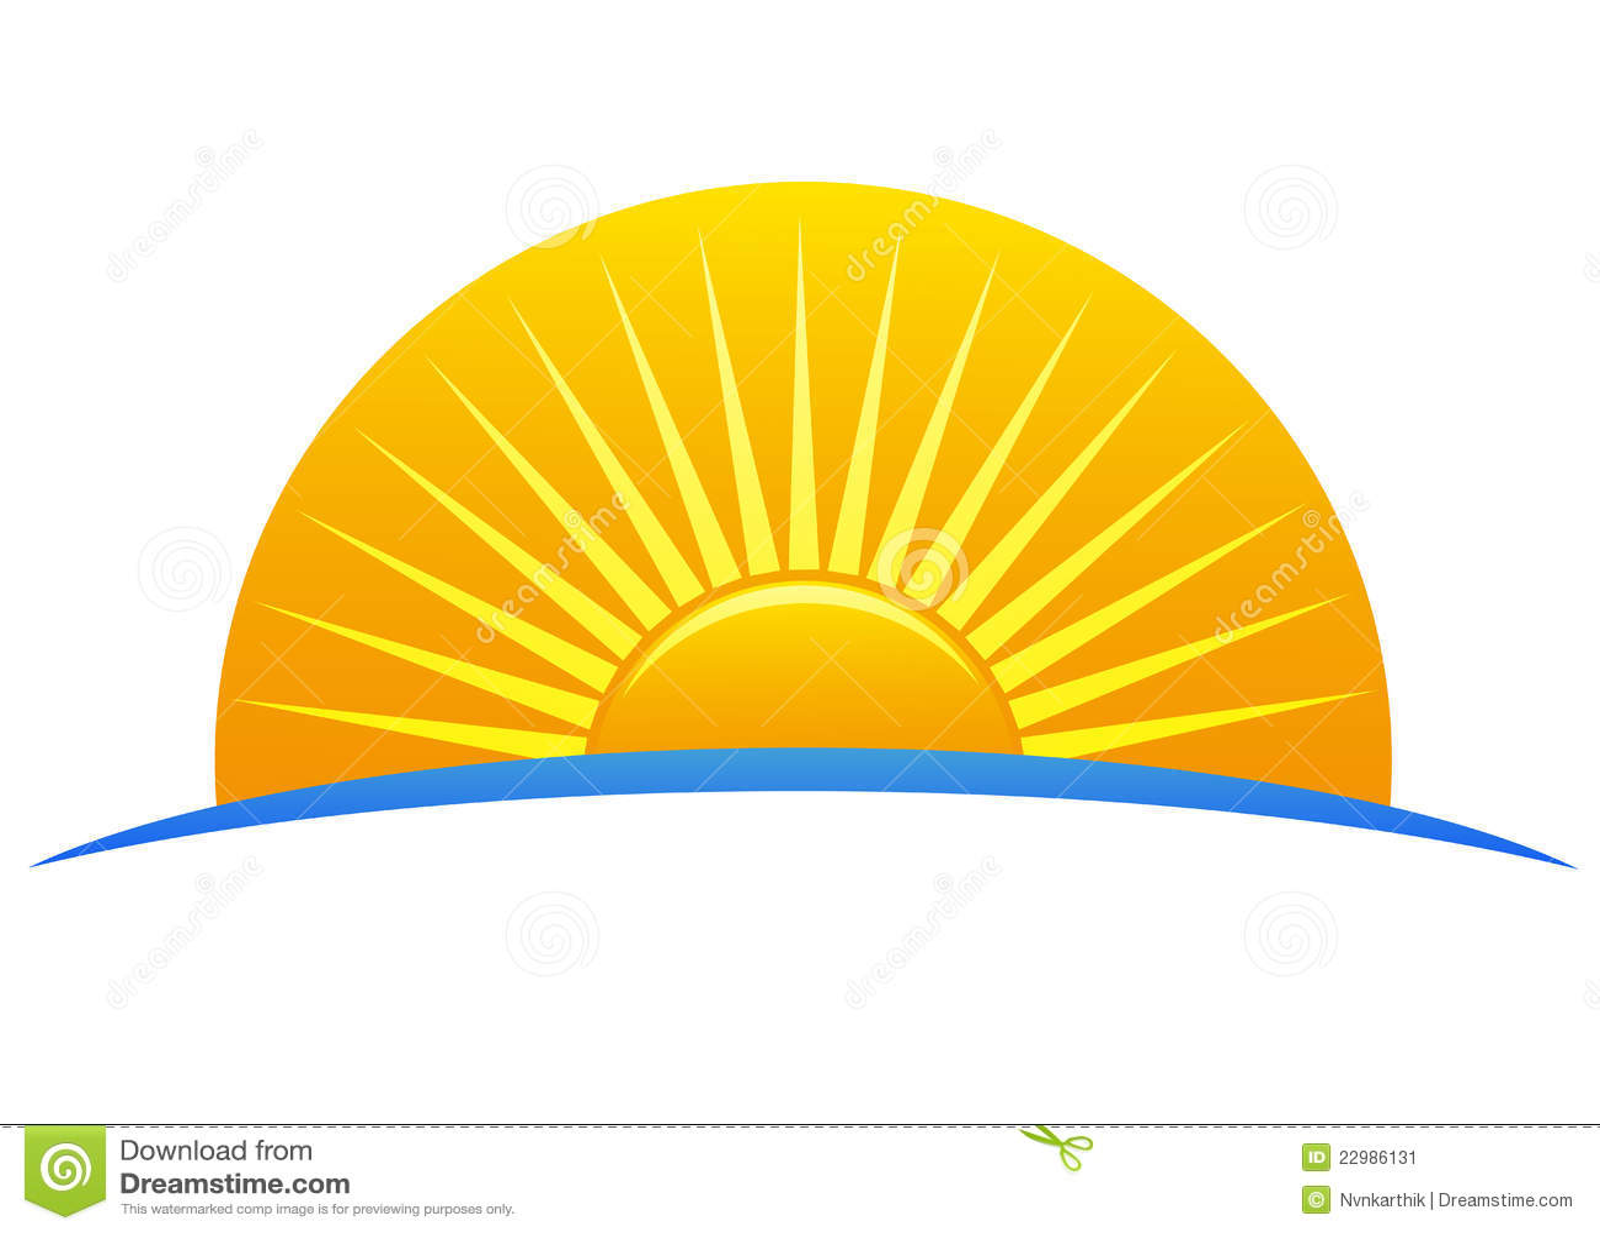 Image Gallery sunshine logos